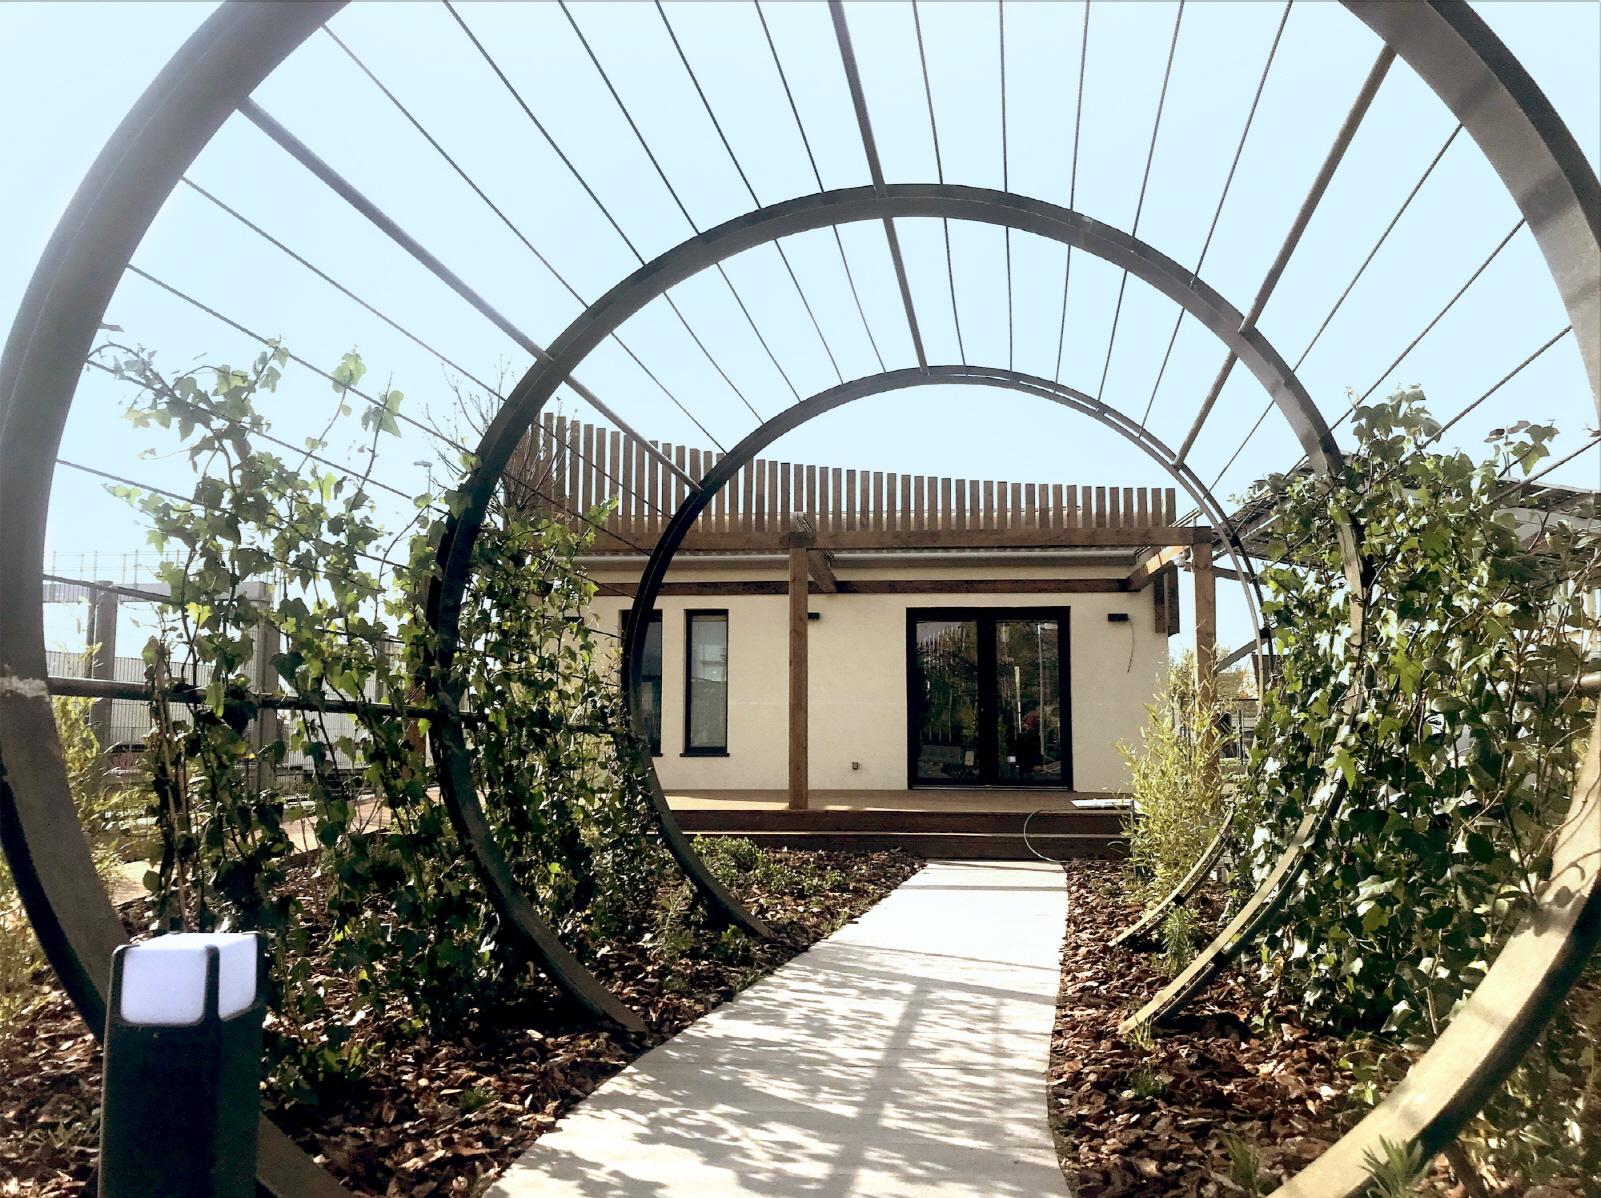 LG전자가 최근 스페인 마드리드에 혁신적이고 환경 친화적 가옥인 'LG 홈(LG Home)'을 선보였다. 사진은 'LG 홈'의 모습